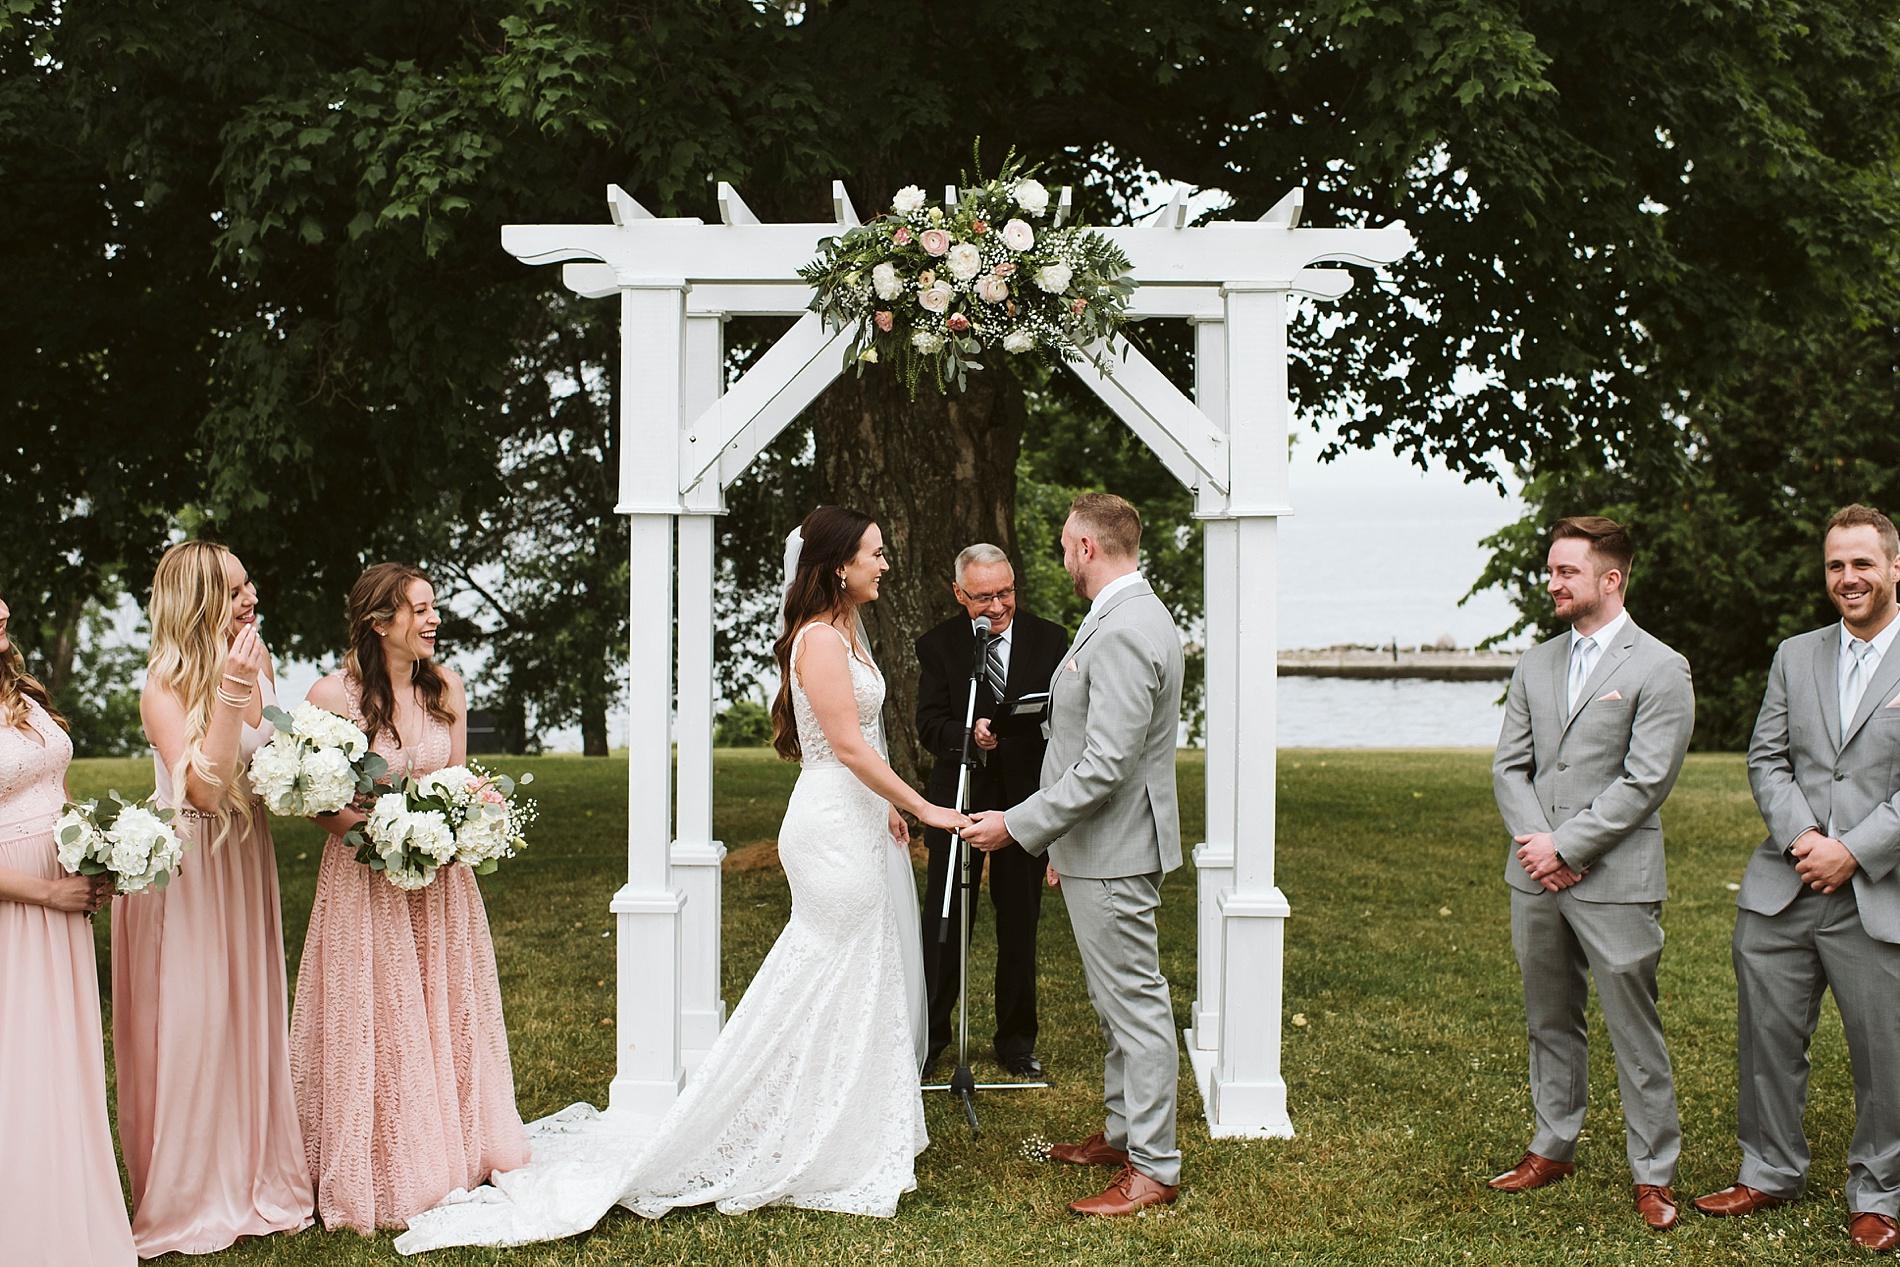 Kawartha_Lakes_Wedding_Bobcageon_Eganridge_Resort_Toronto_Photographer_0036.jpg